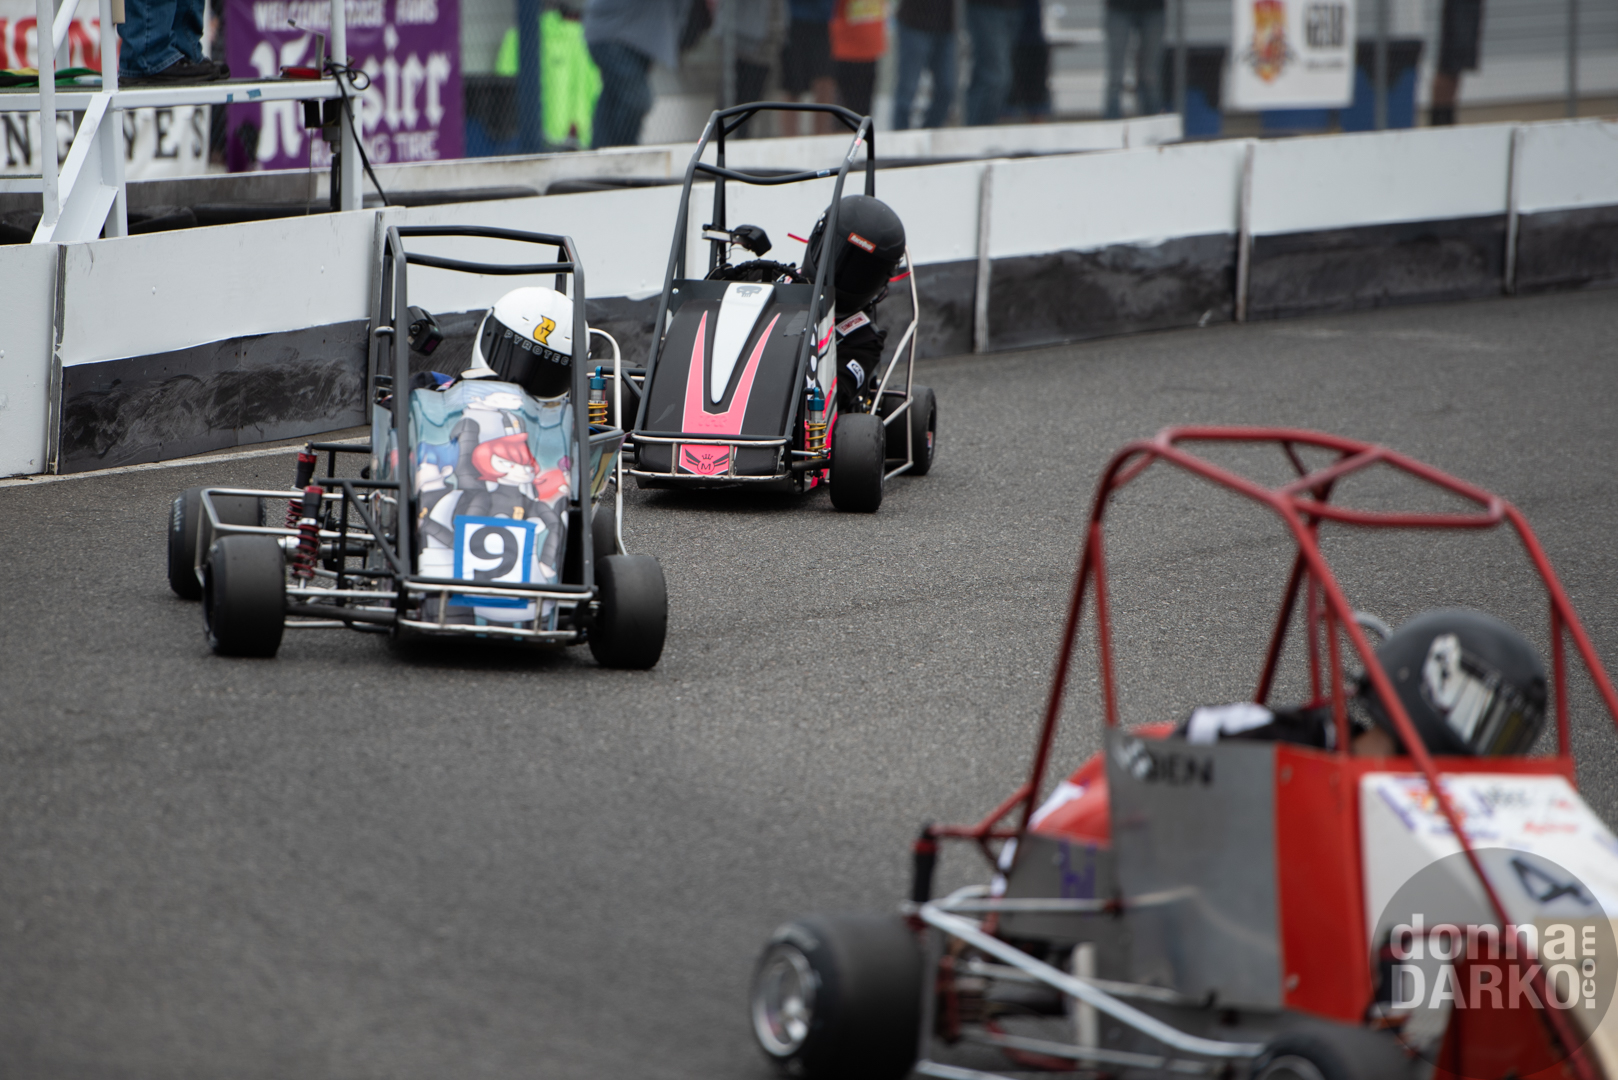 QWMA (Racing) 8-11-2019 DSC_6411.jpg